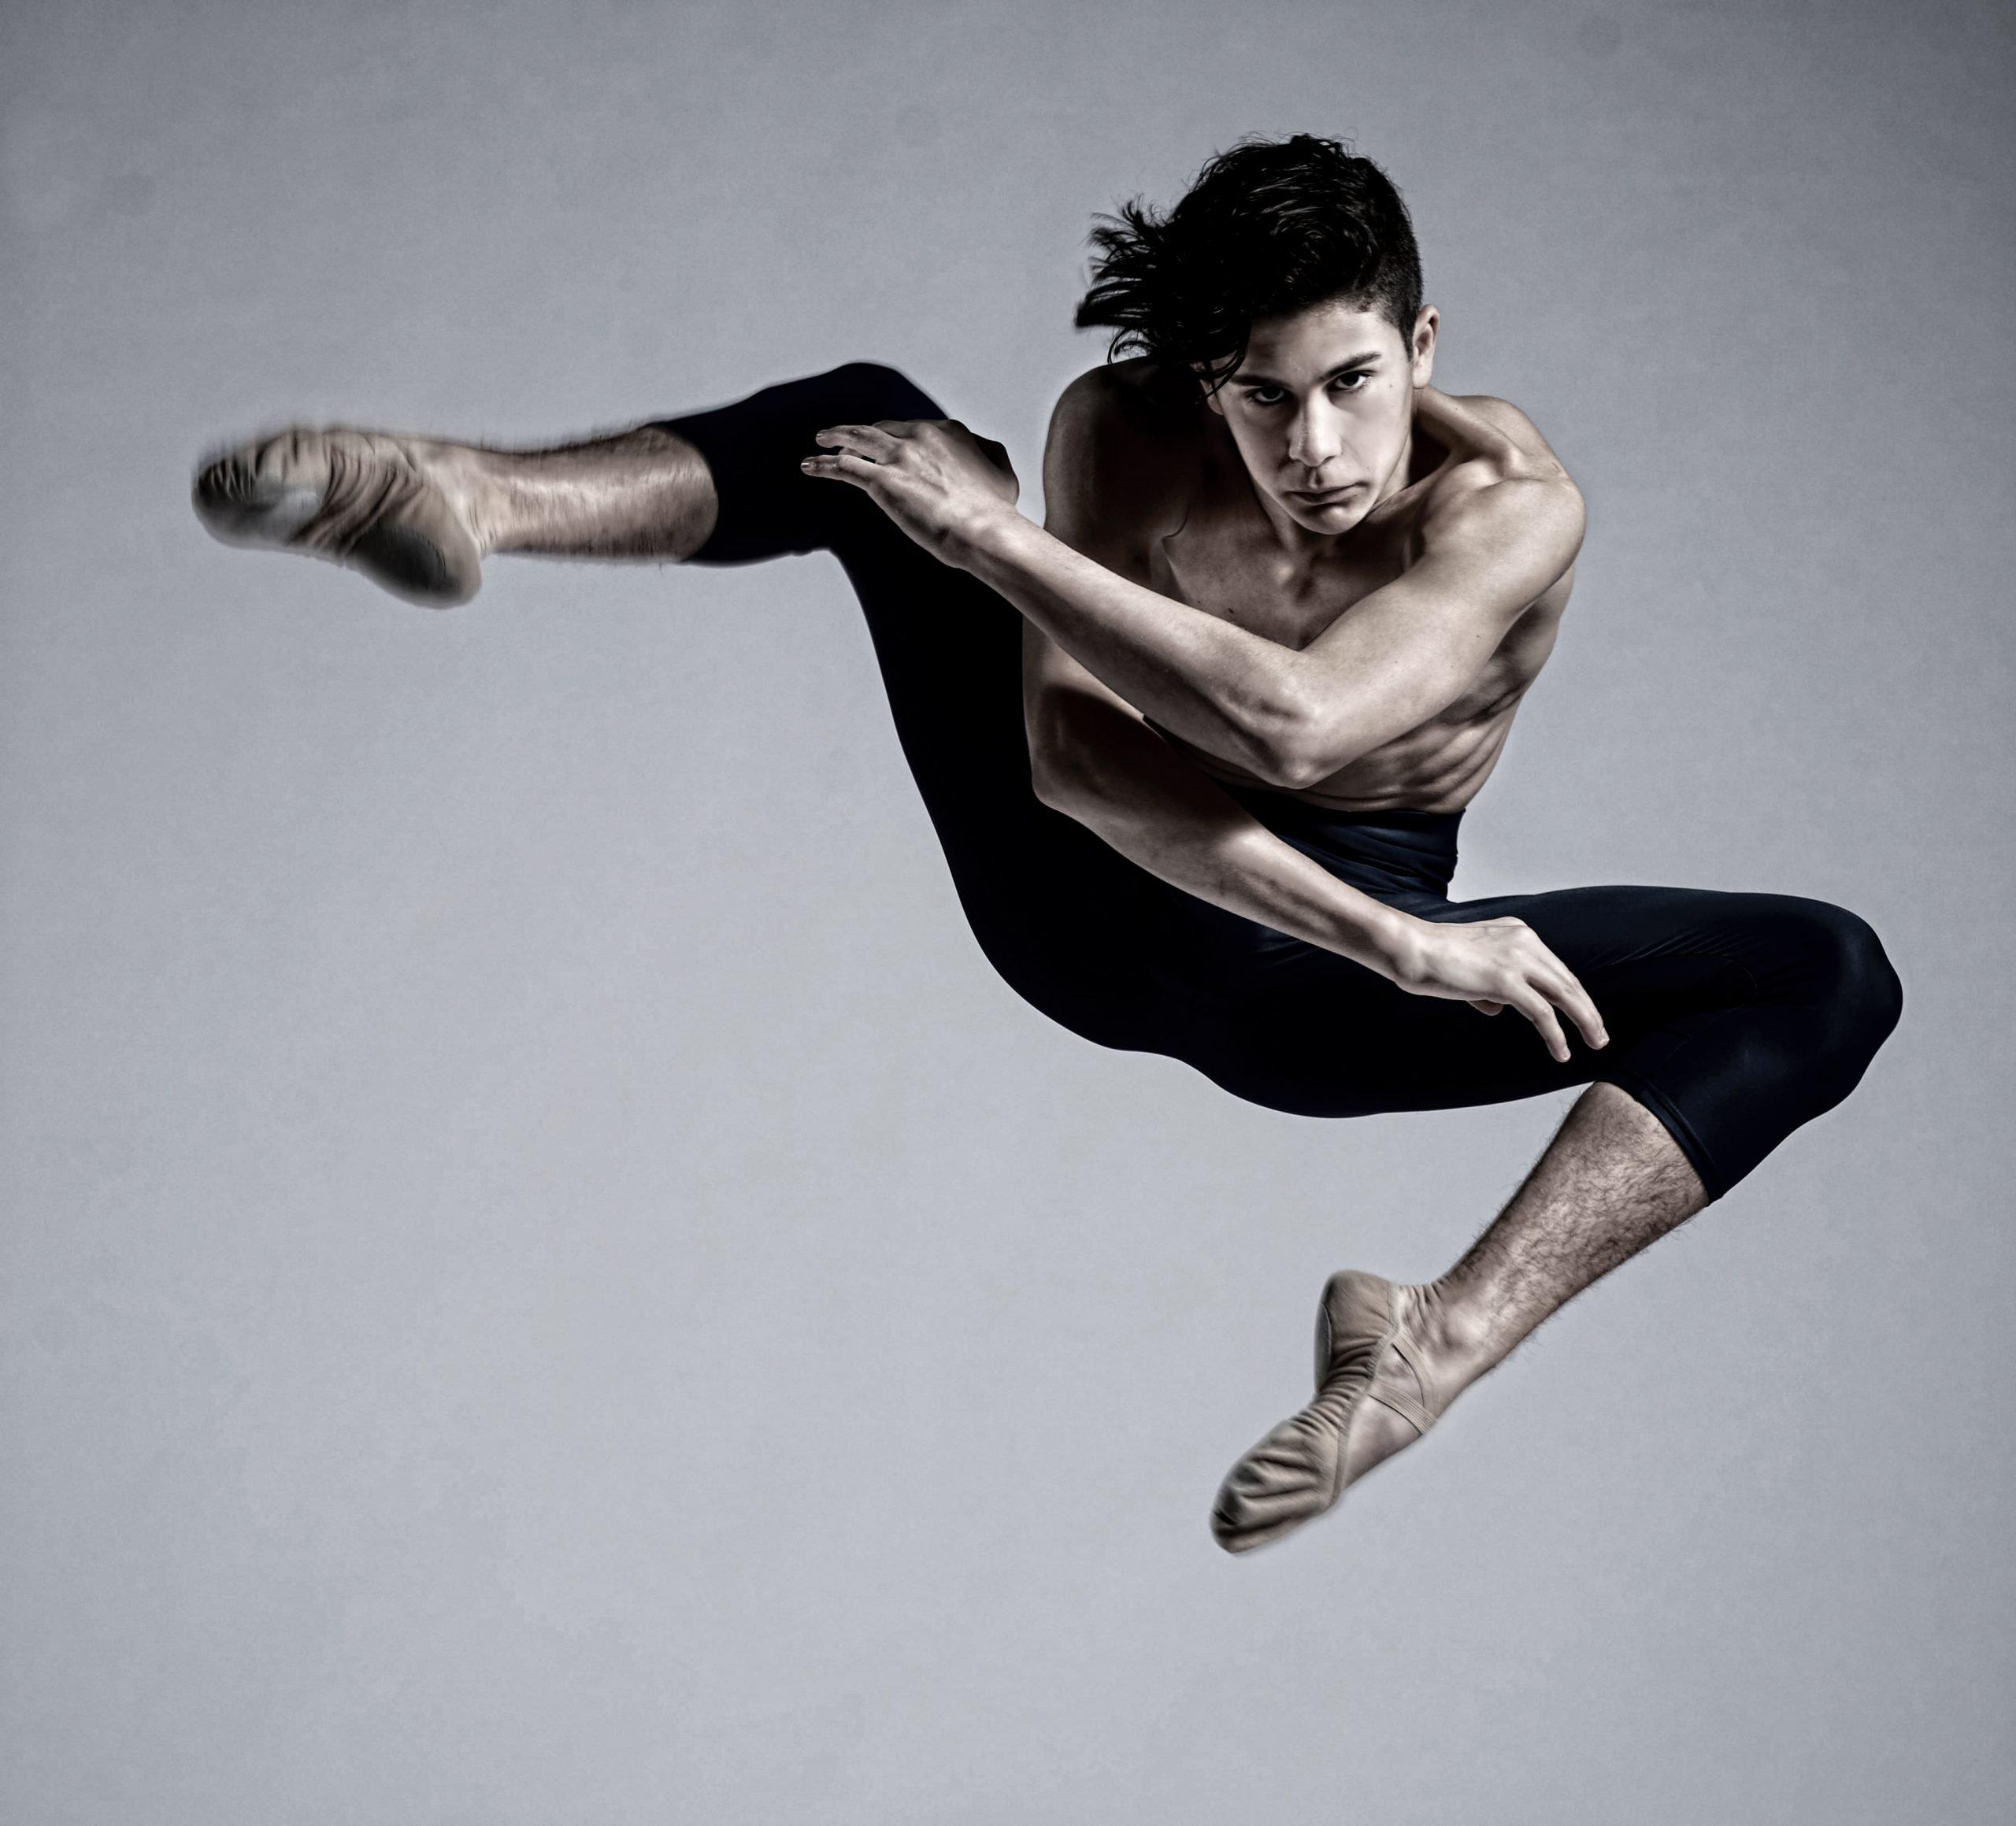 Acton Dance Photography